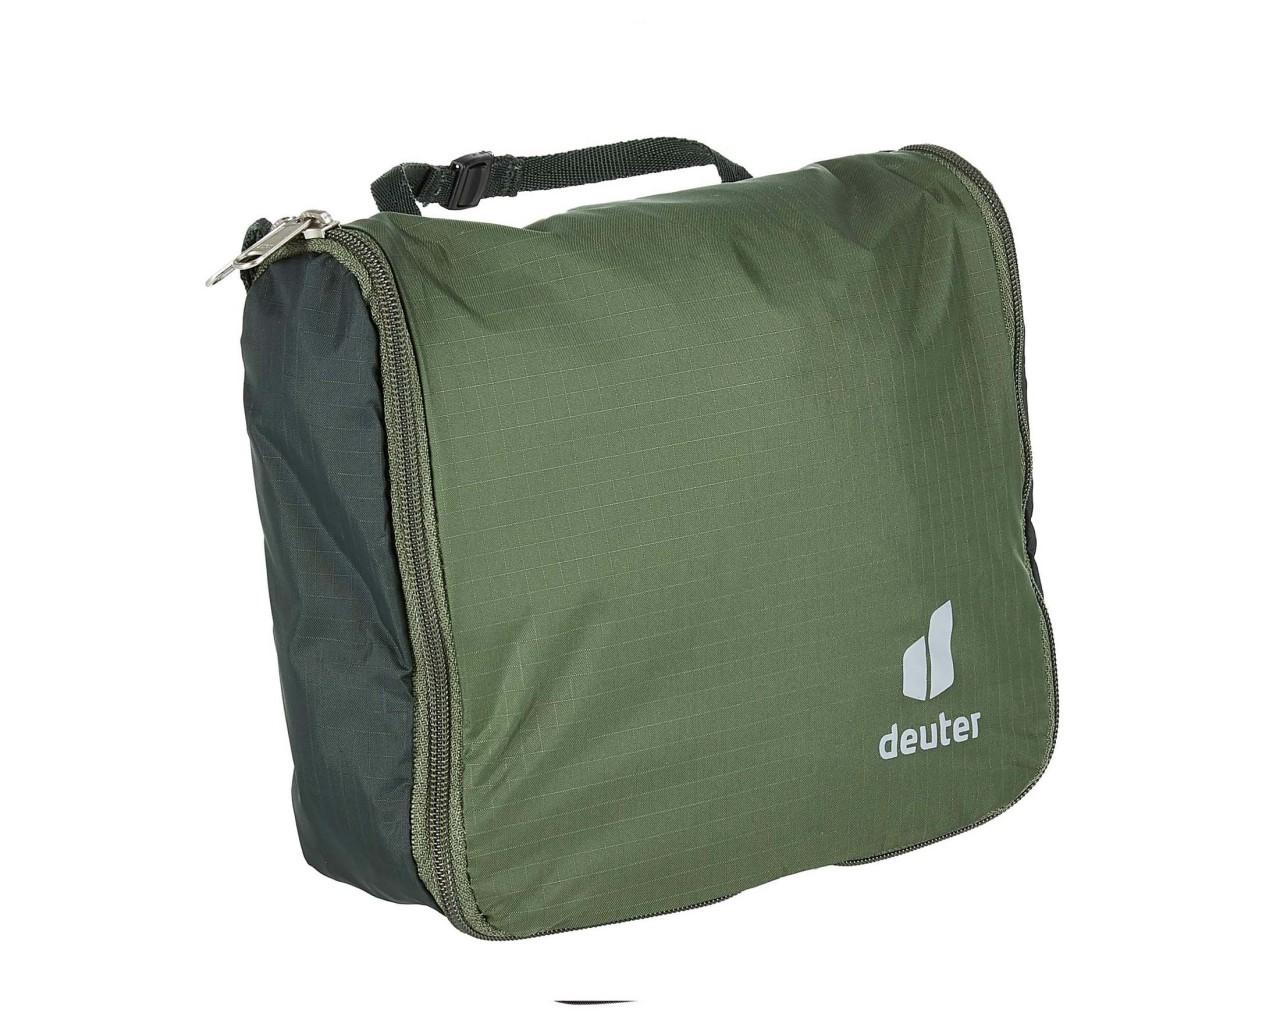 Deuter Wash Center Lite I - 1.5 litre wash pack | khaki-ivy